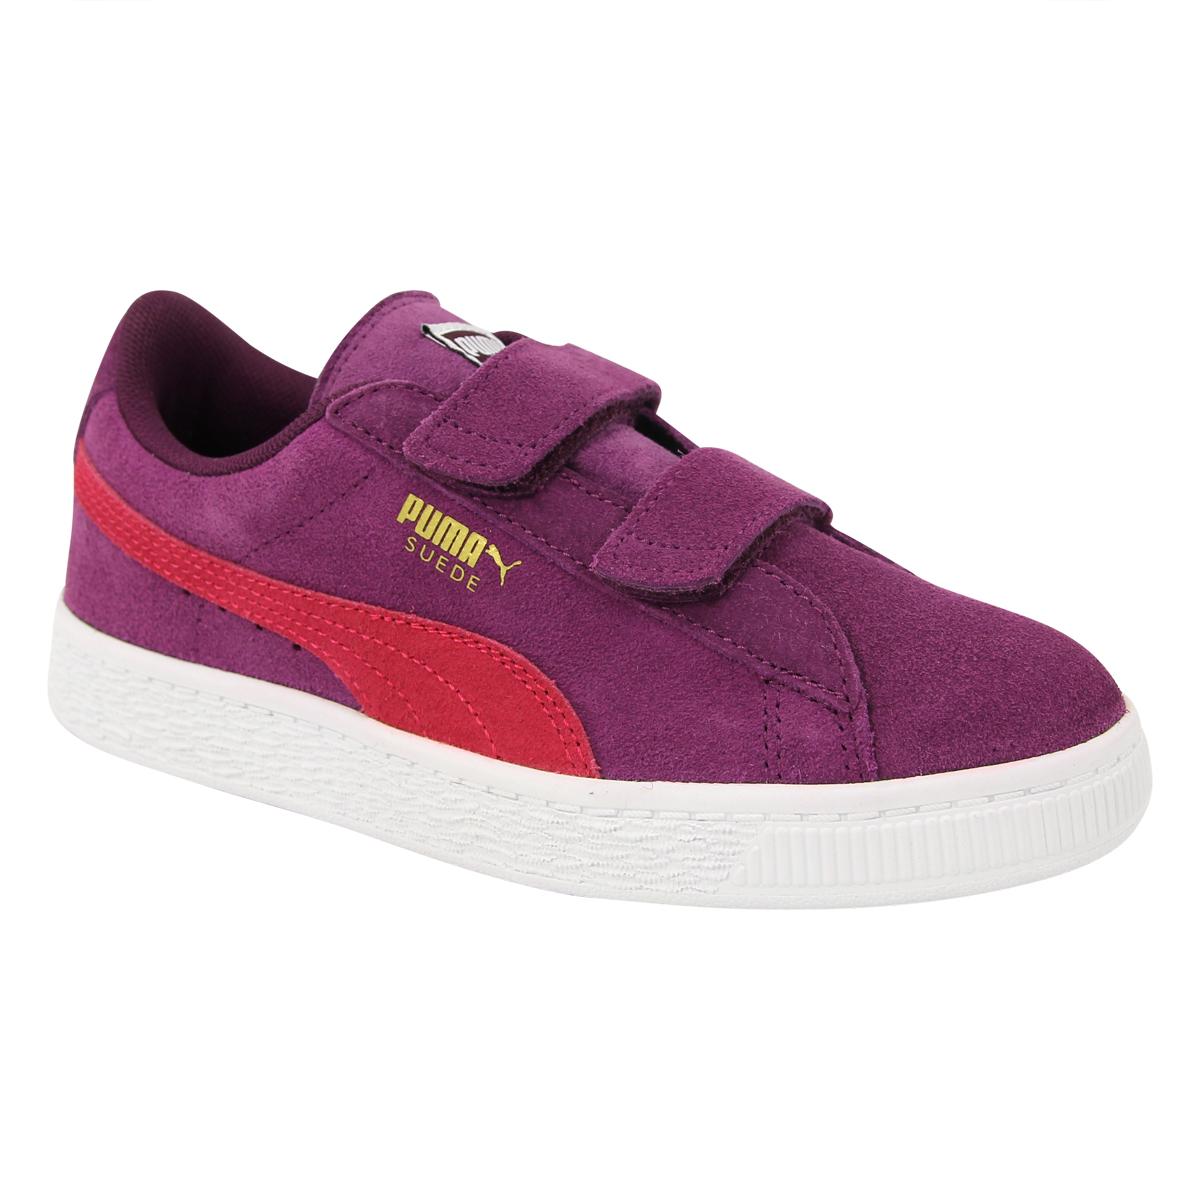 cc6c829973c13 Puma SUEDE 2 STRAPS Chaussures Mode Sneakers Enfant Cuir Suede